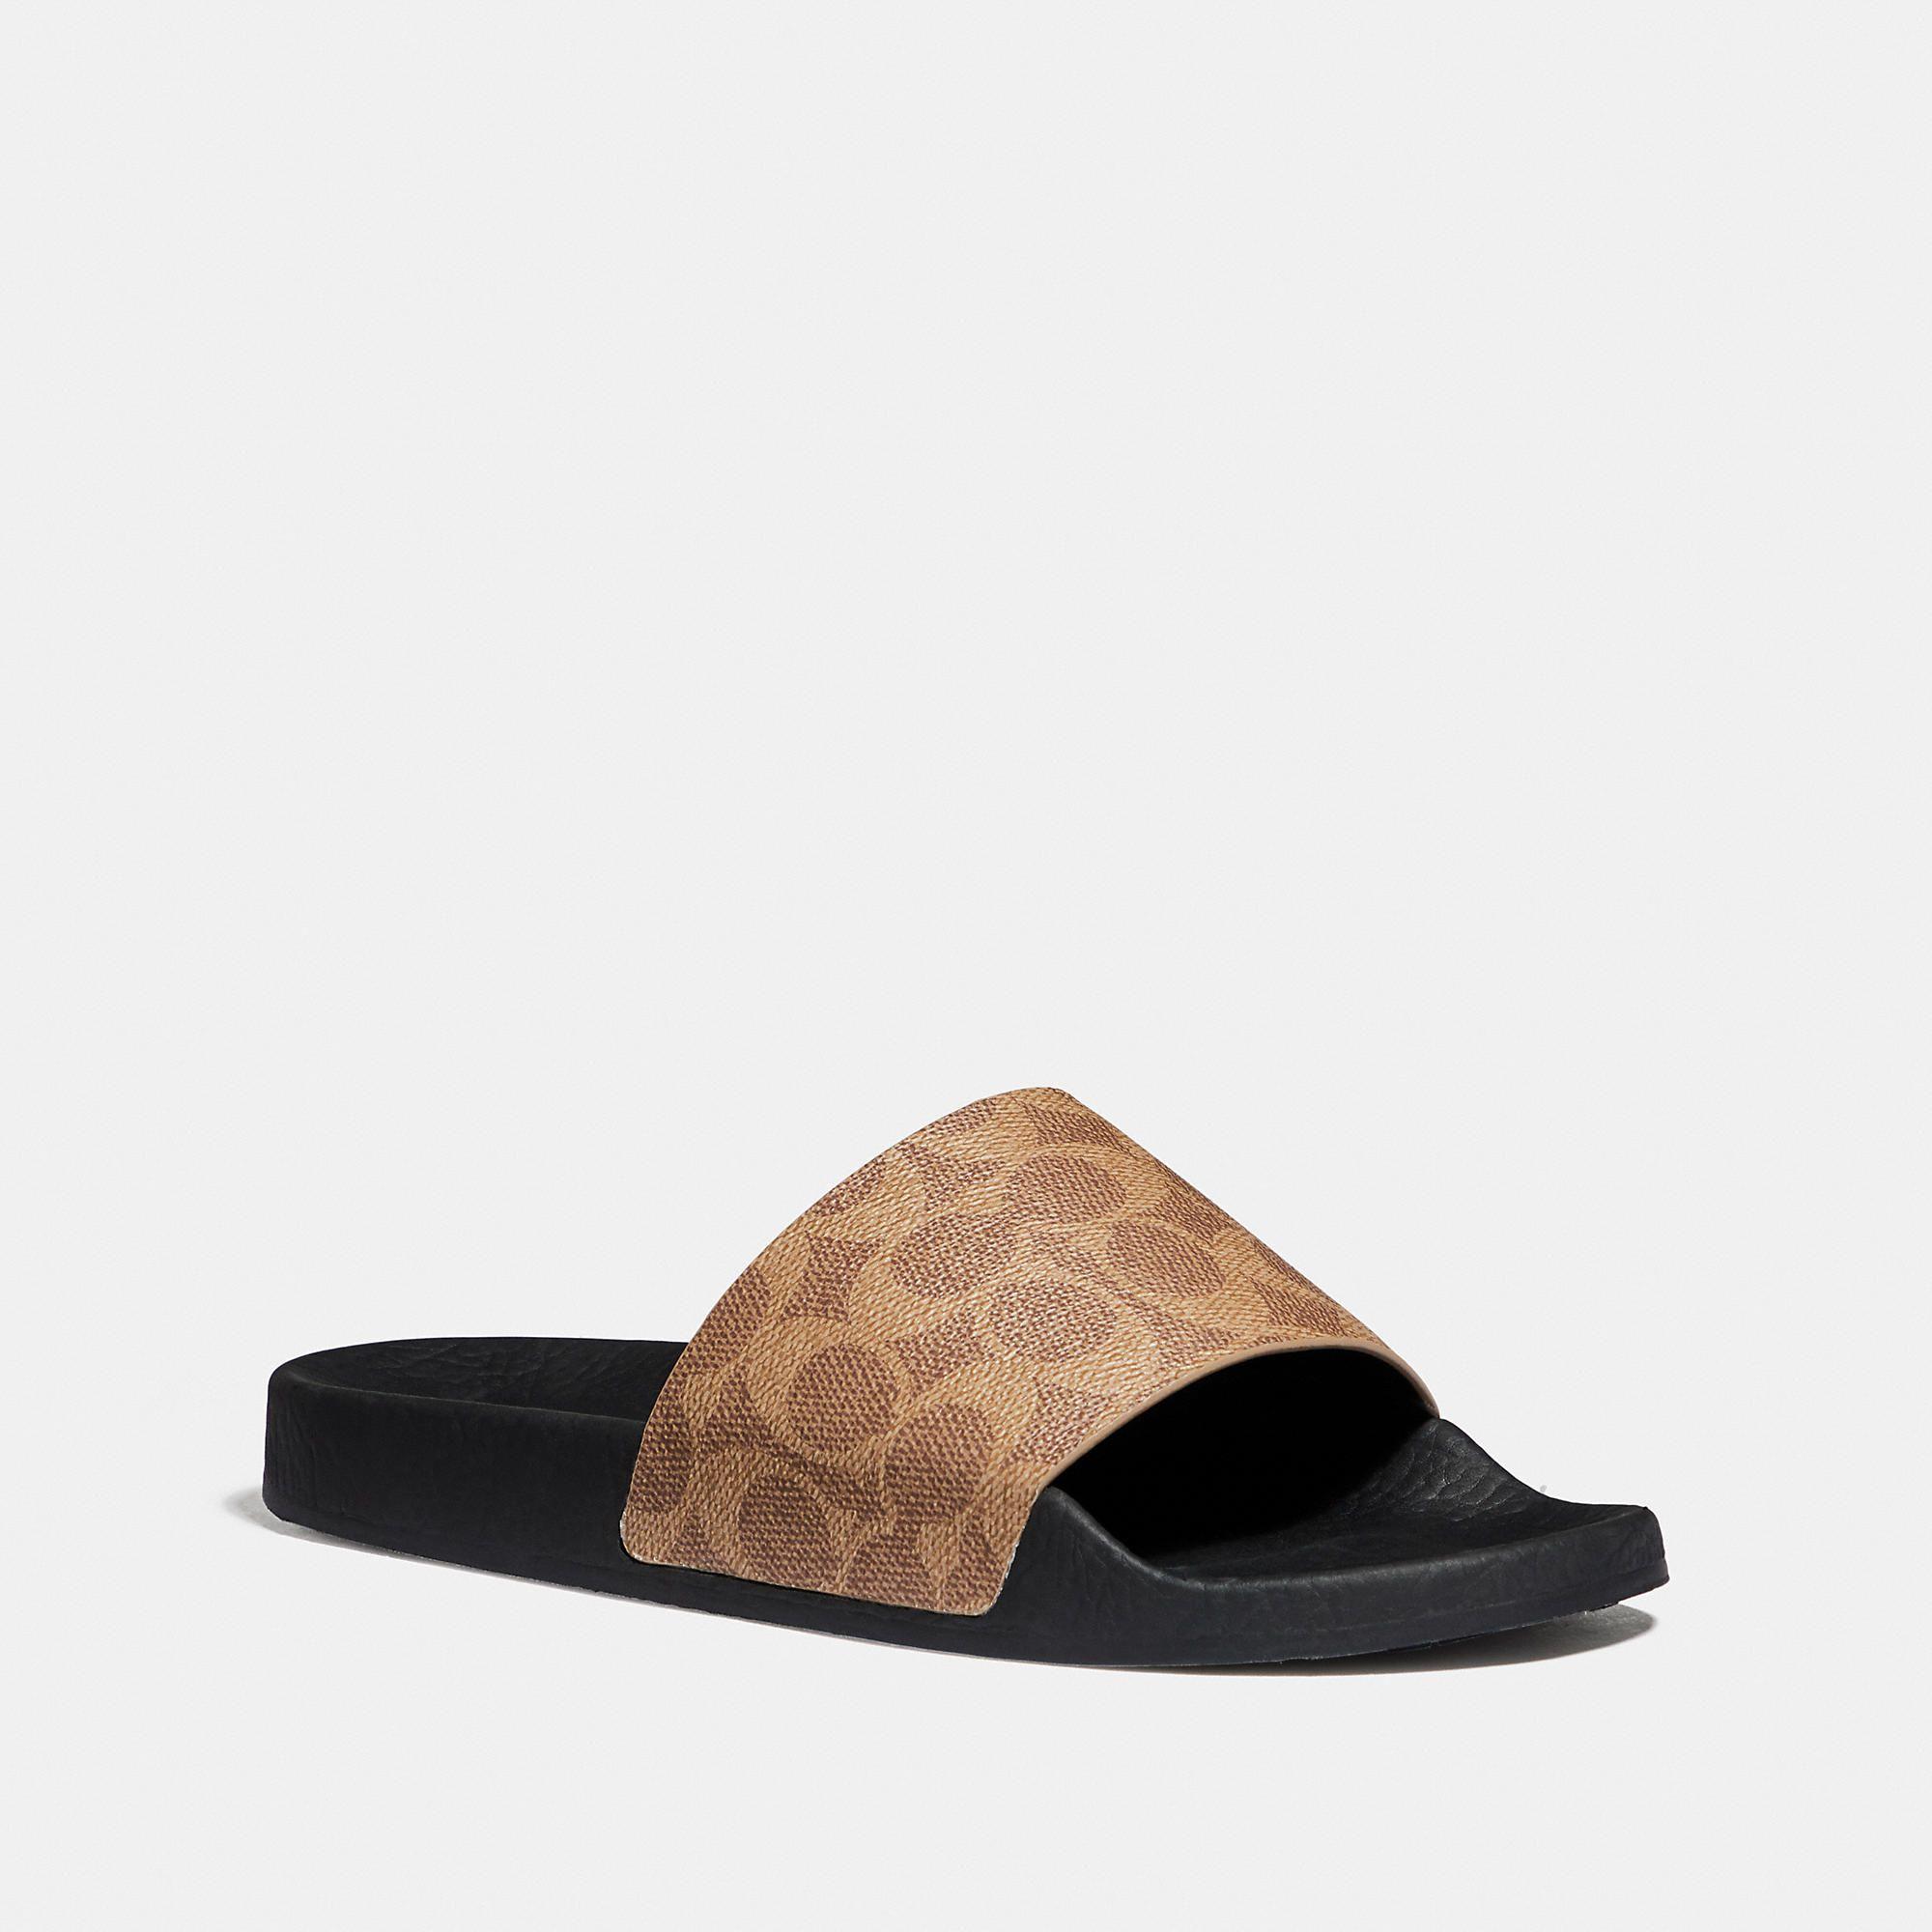 Udele Sport Slide Women shoes heels pump, Leather dress